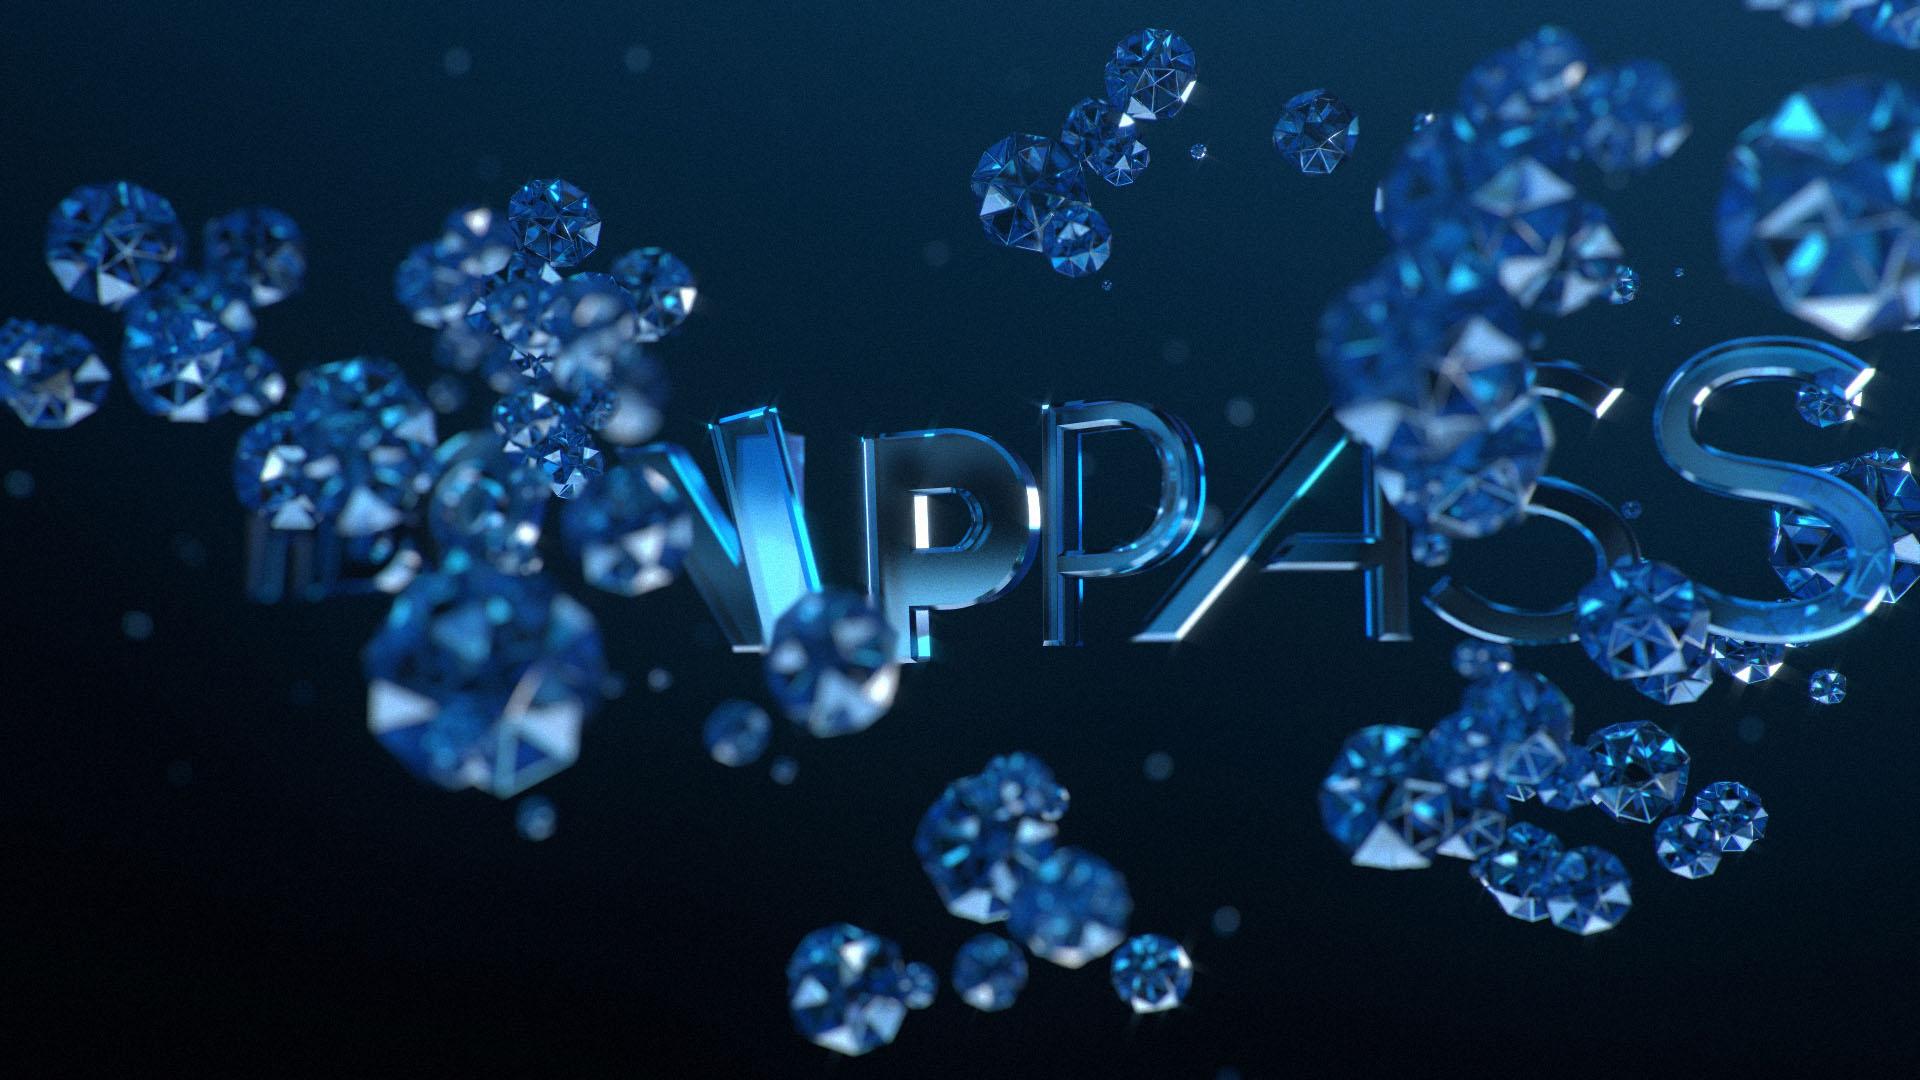 VIP_OPEN_02.jpg